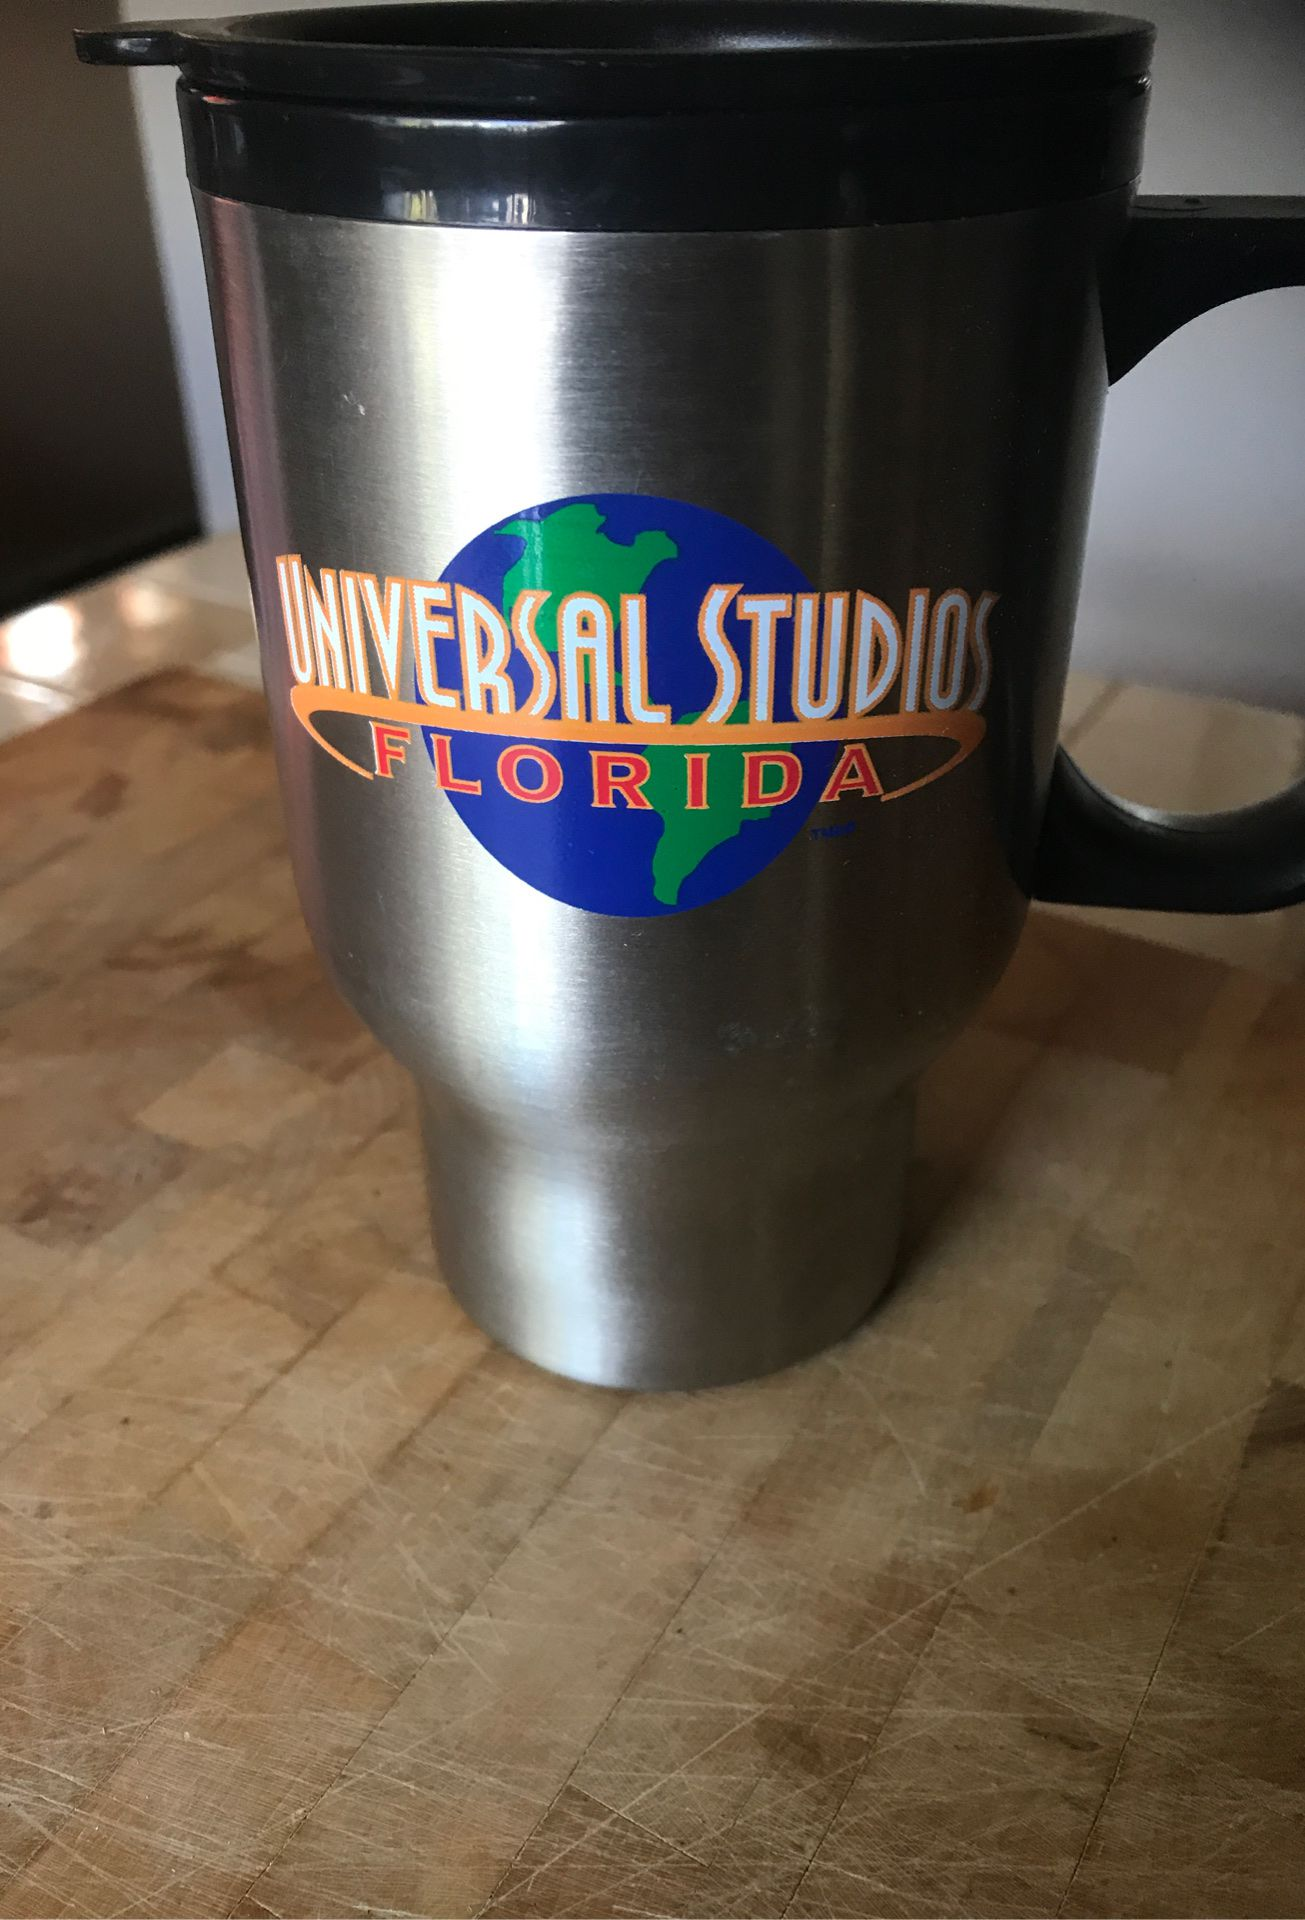 Universal studios insulated coffee mug